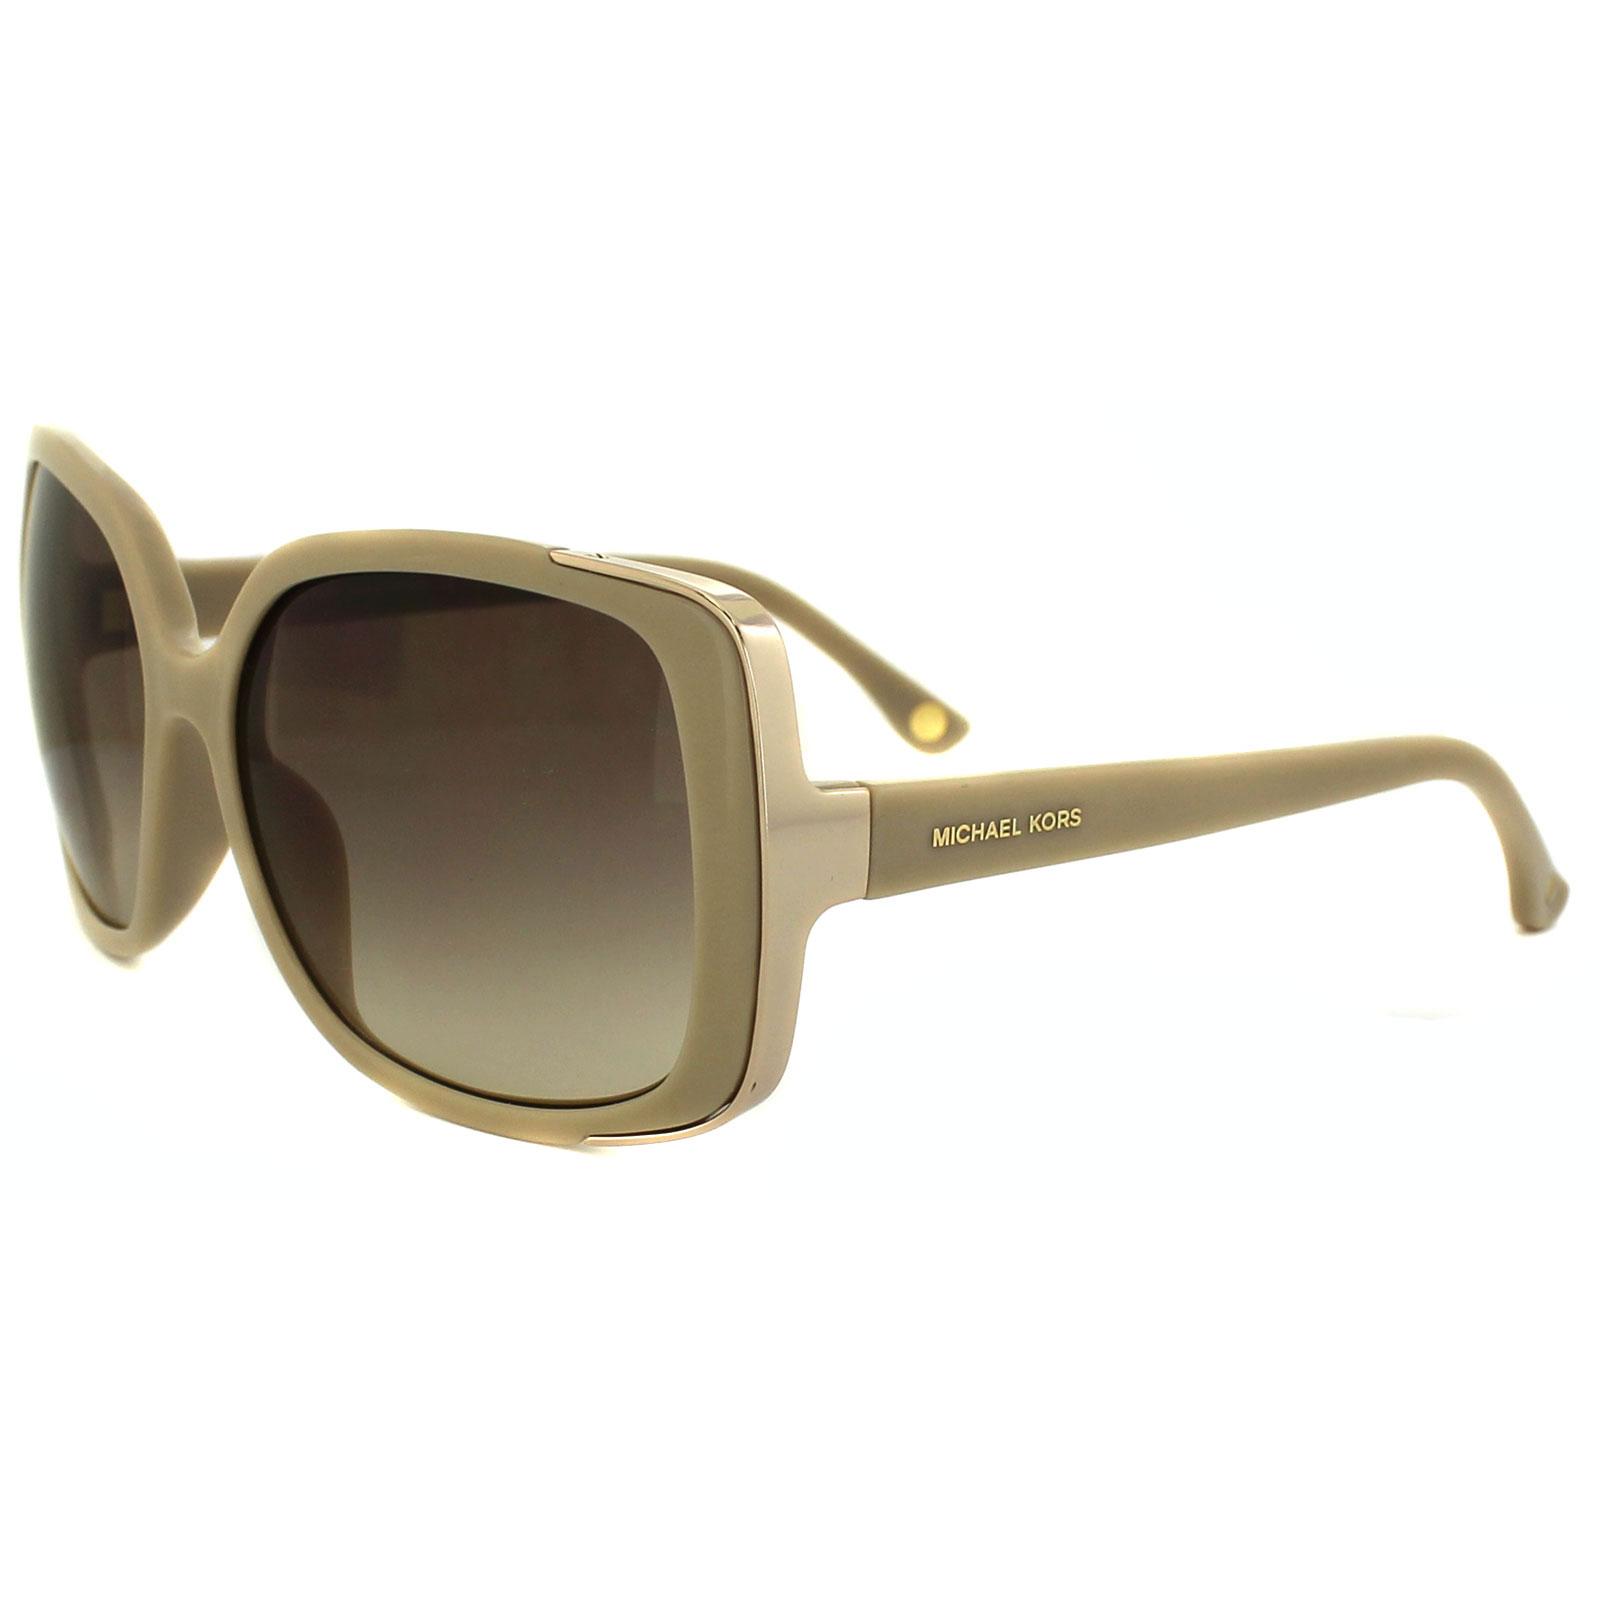 57b649614e Cheap Michael Kors Gabriella MKS290 Sunglasses - Discounted Sunglasses